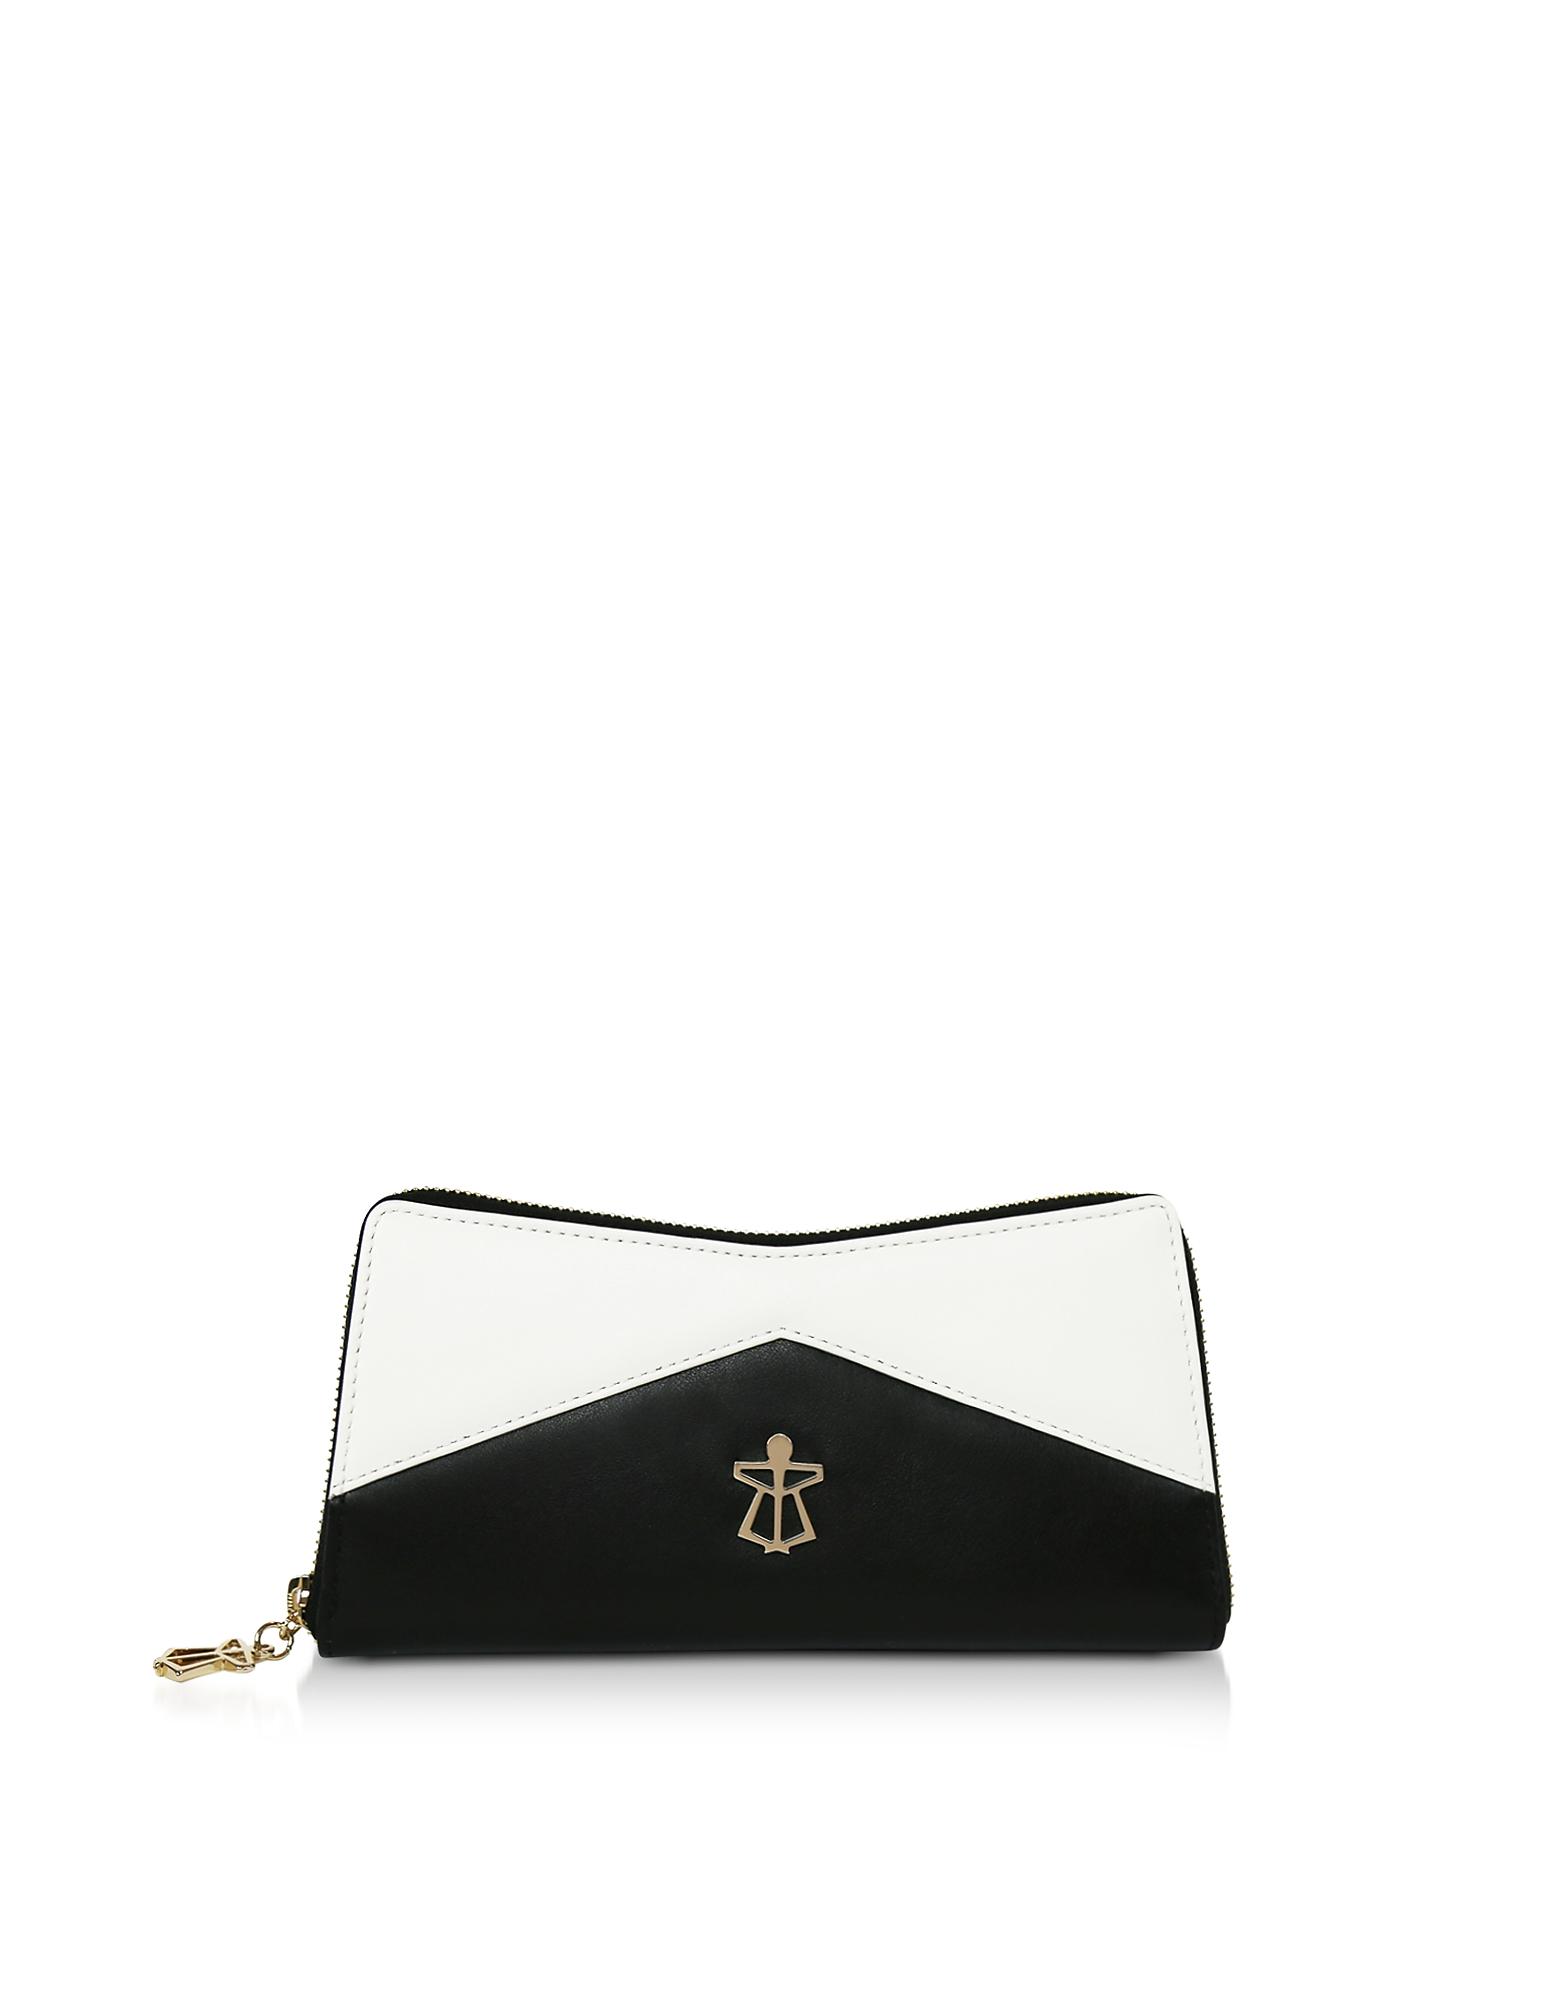 Black & White Leather Lara Wallet